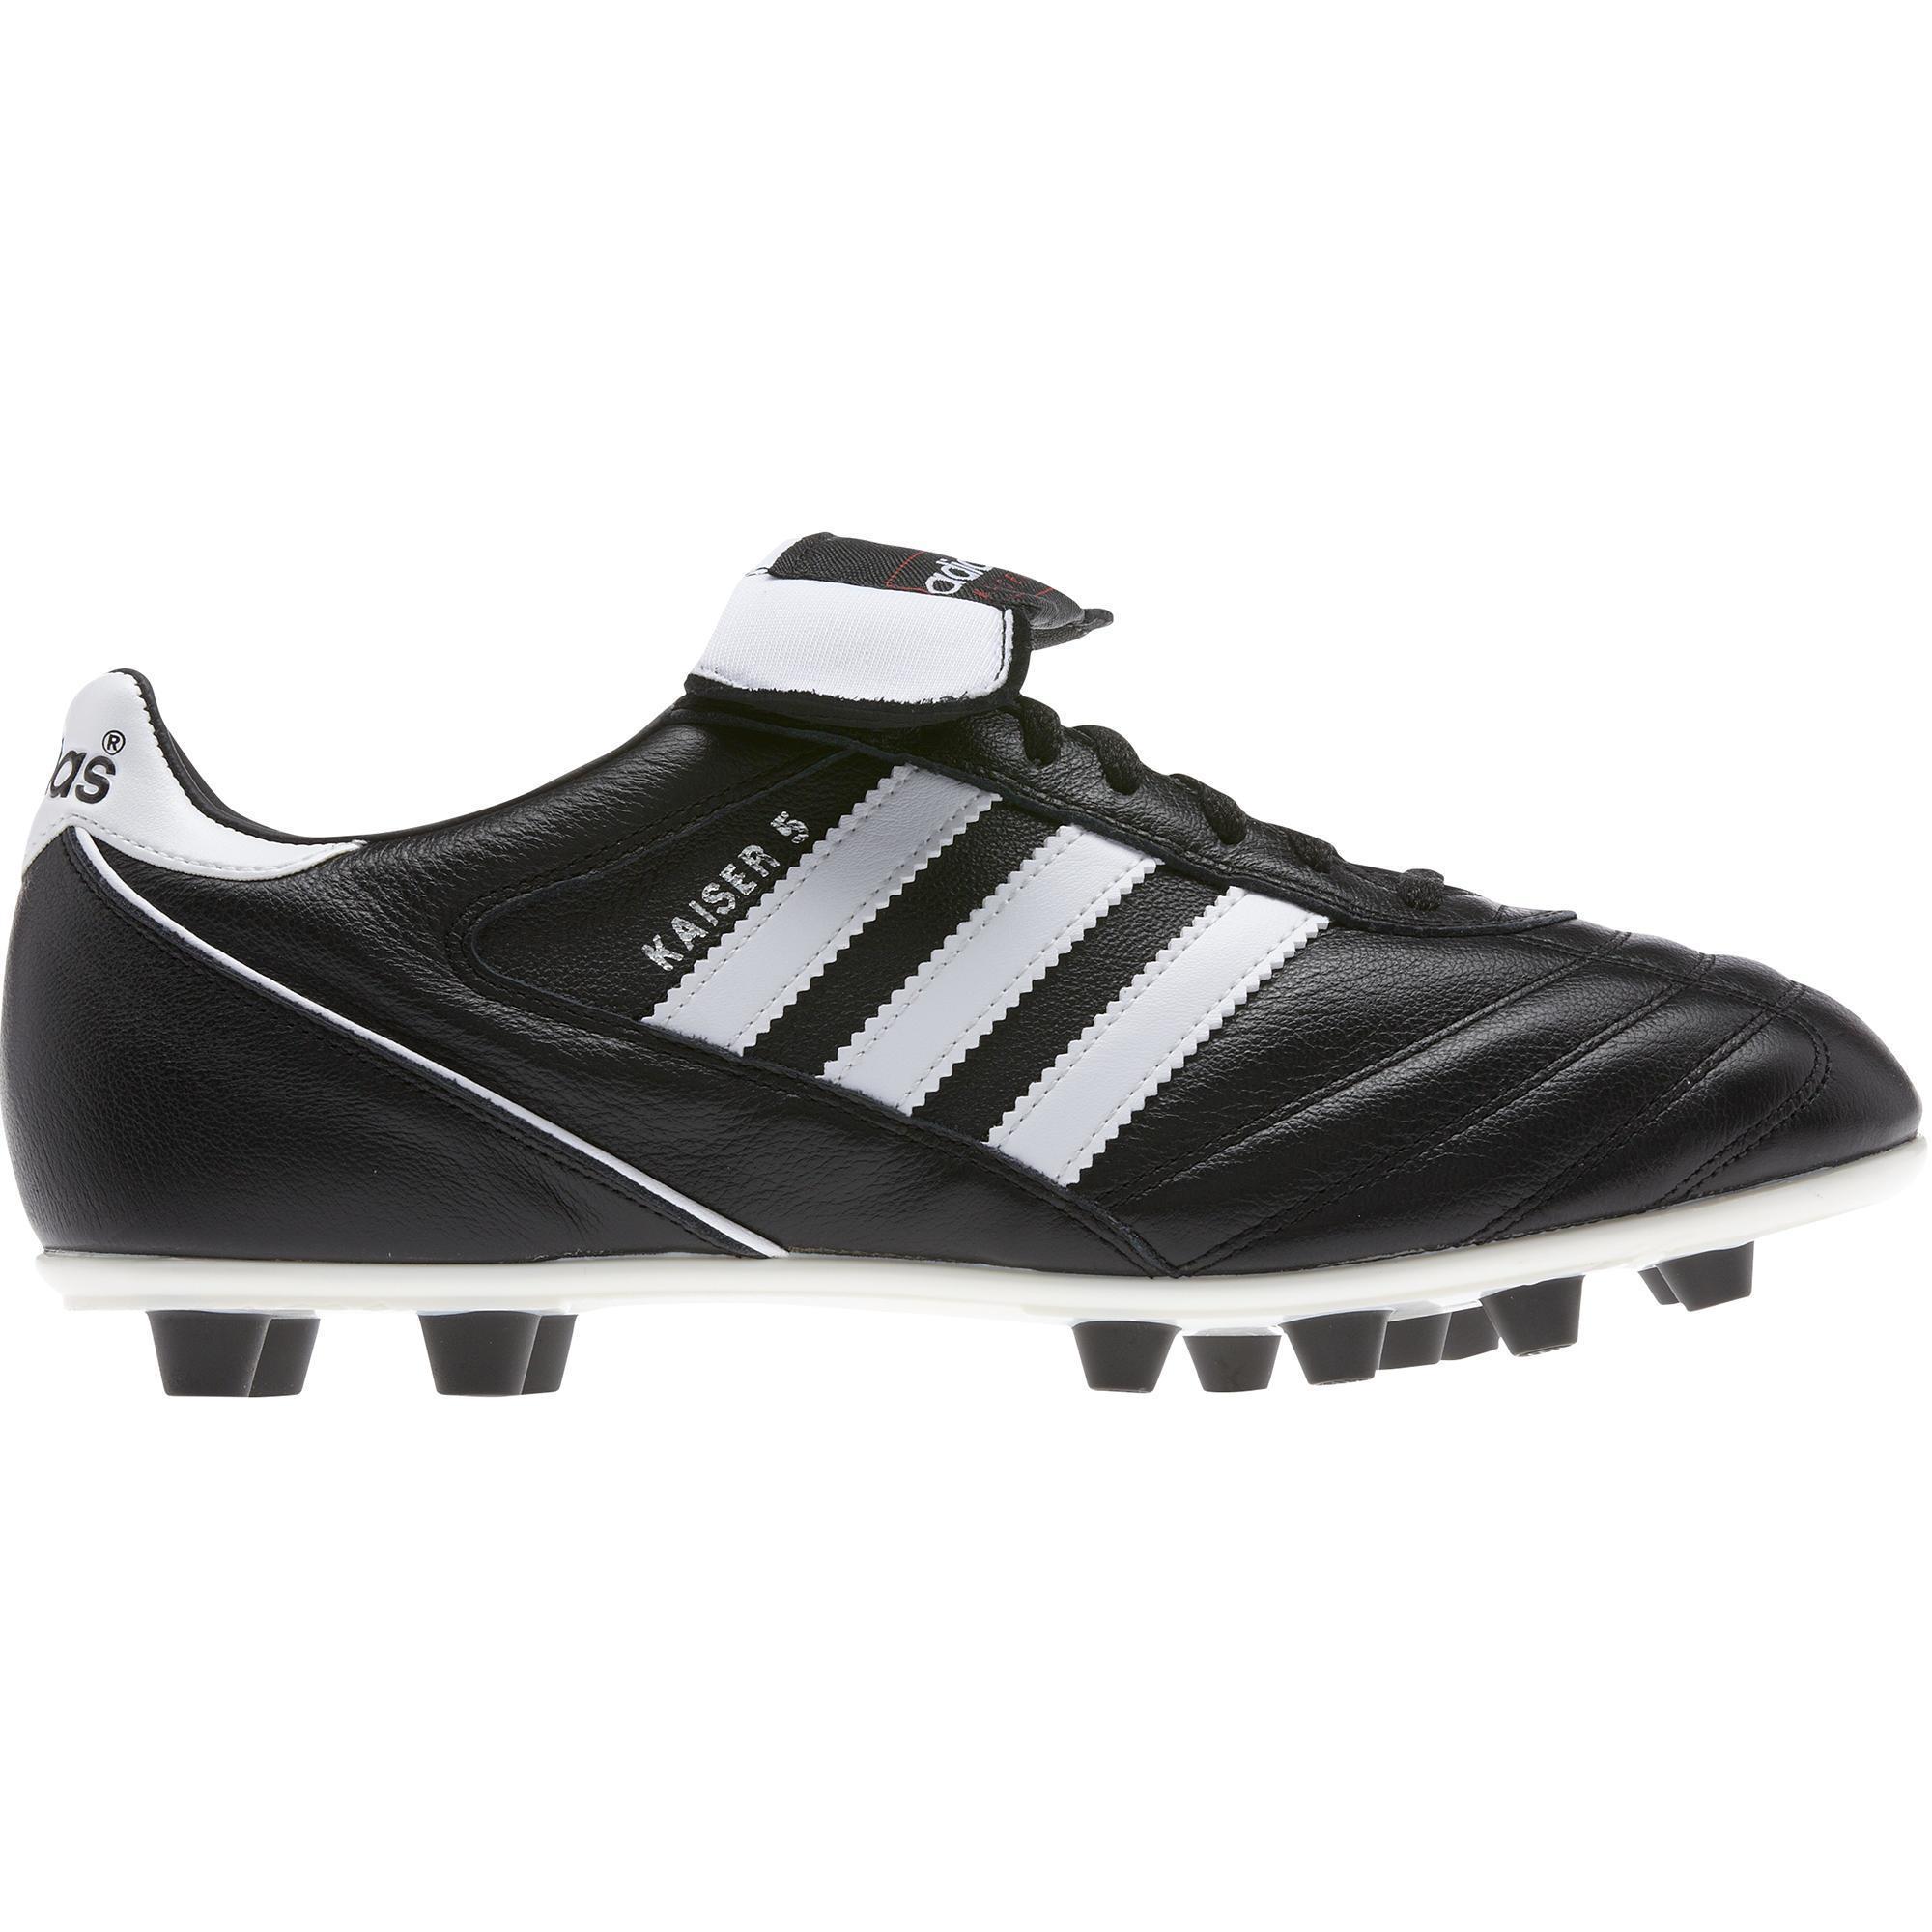 Chaussures de Football Adidas Kaiser 5 Liga Size: 40 pas cher